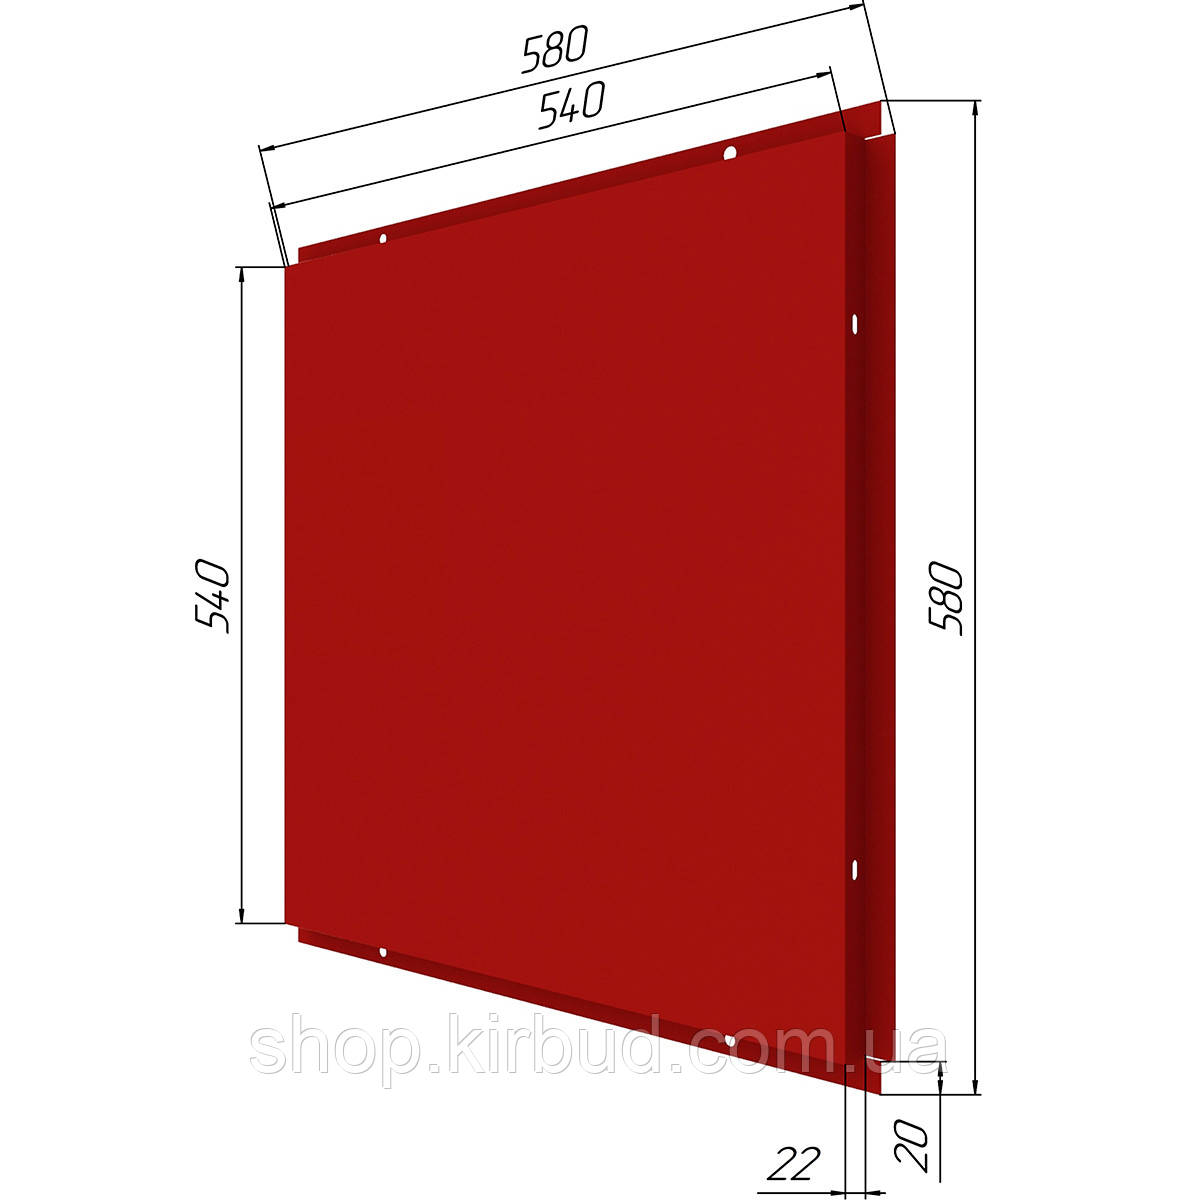 Фасадные касети (под заказ) оцинкованые 0,50мм 580х580мм